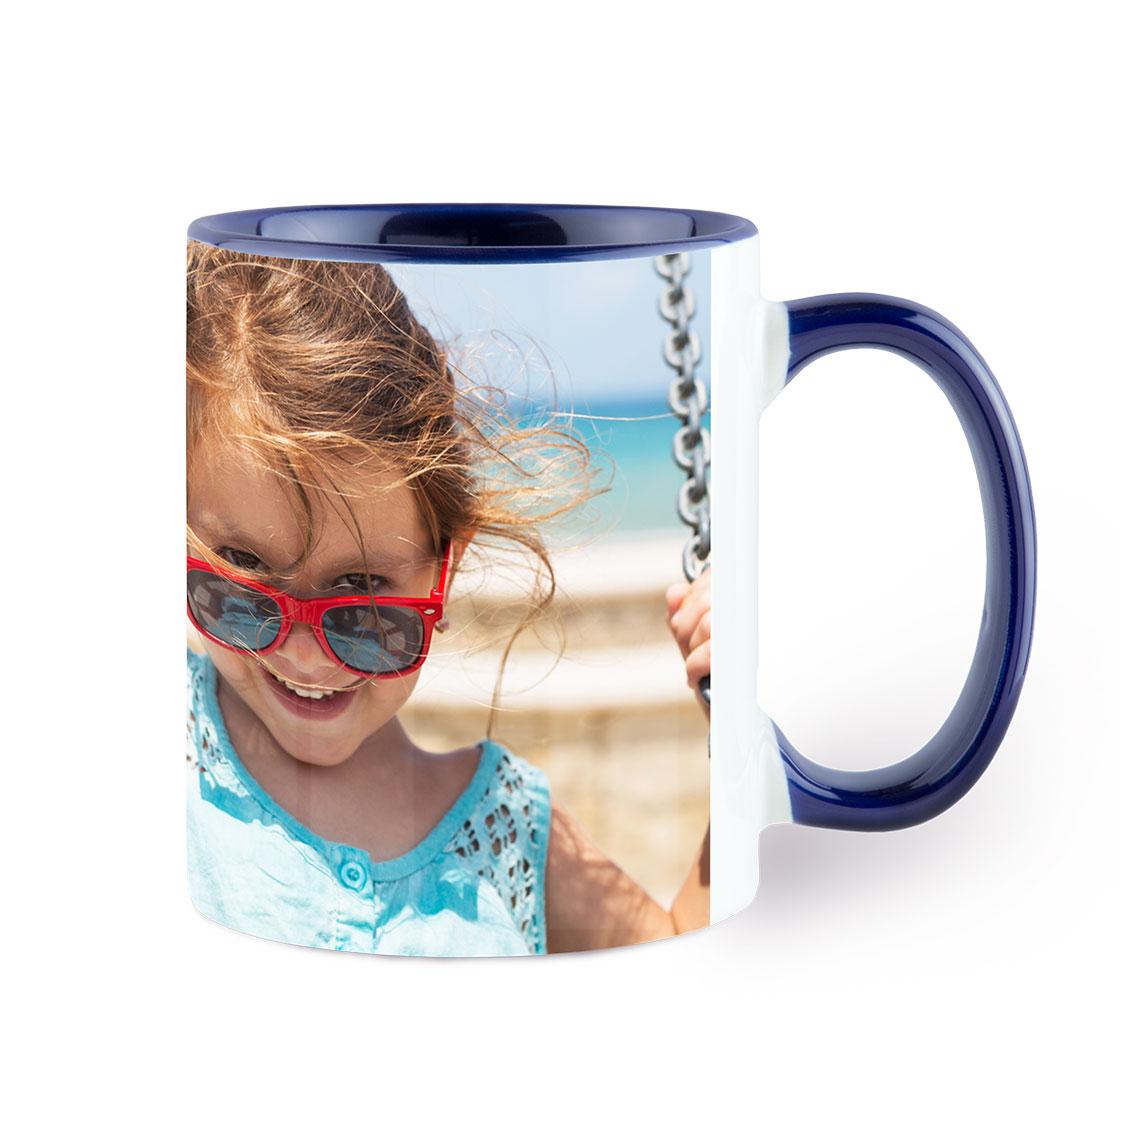 navy colorful mug - Colorful Mugs